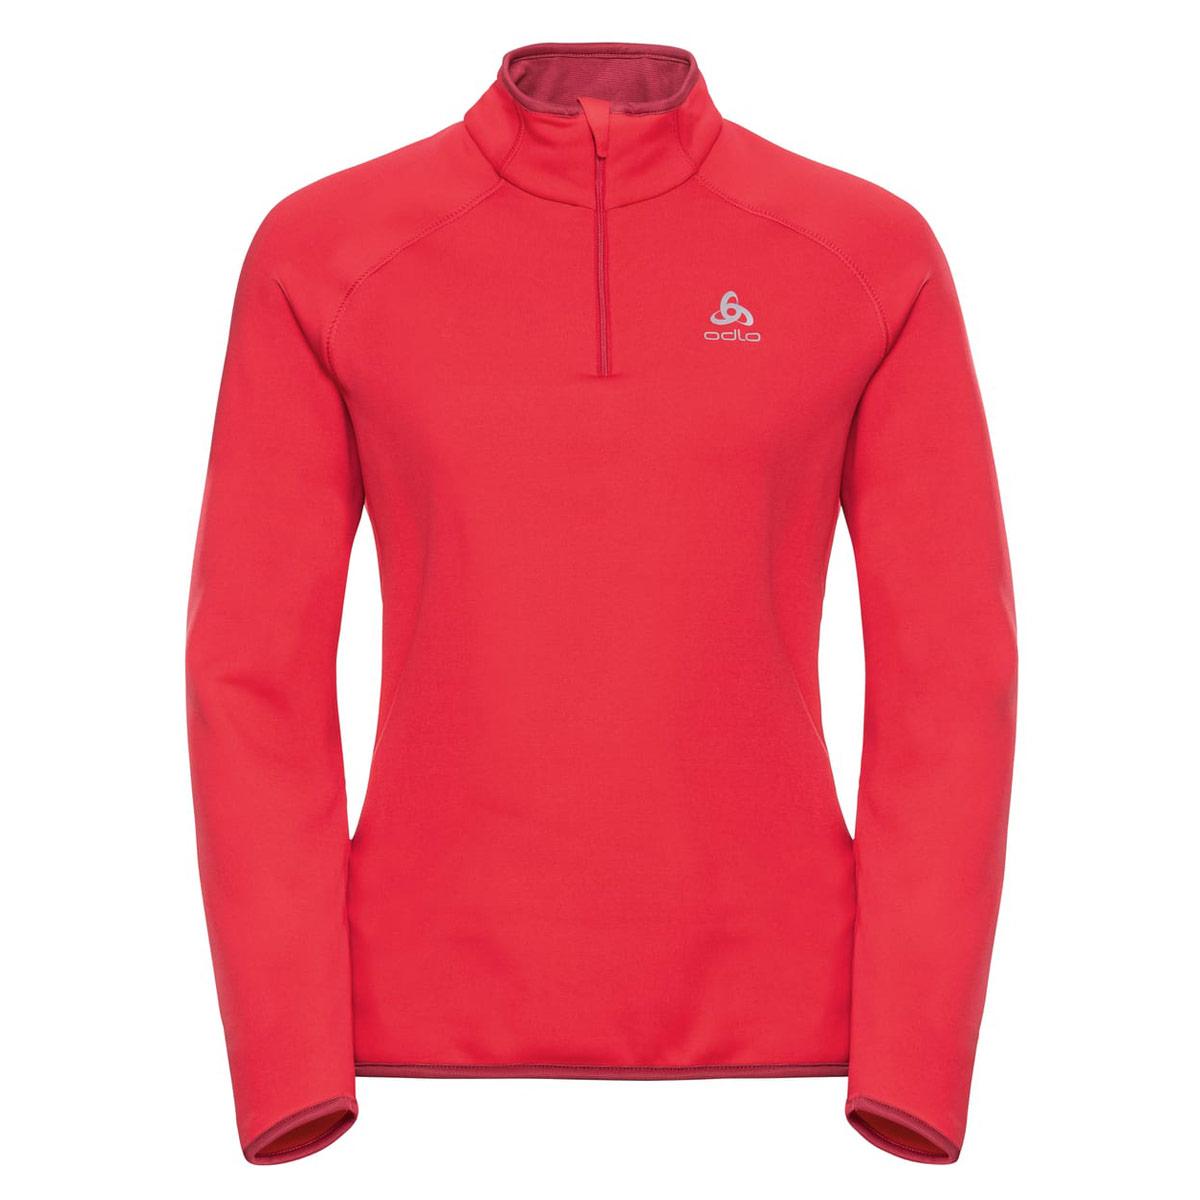 625ea38a0 Odlo Midlayer 1 2 Zip Carve Warm - Running tops for Women - Pink